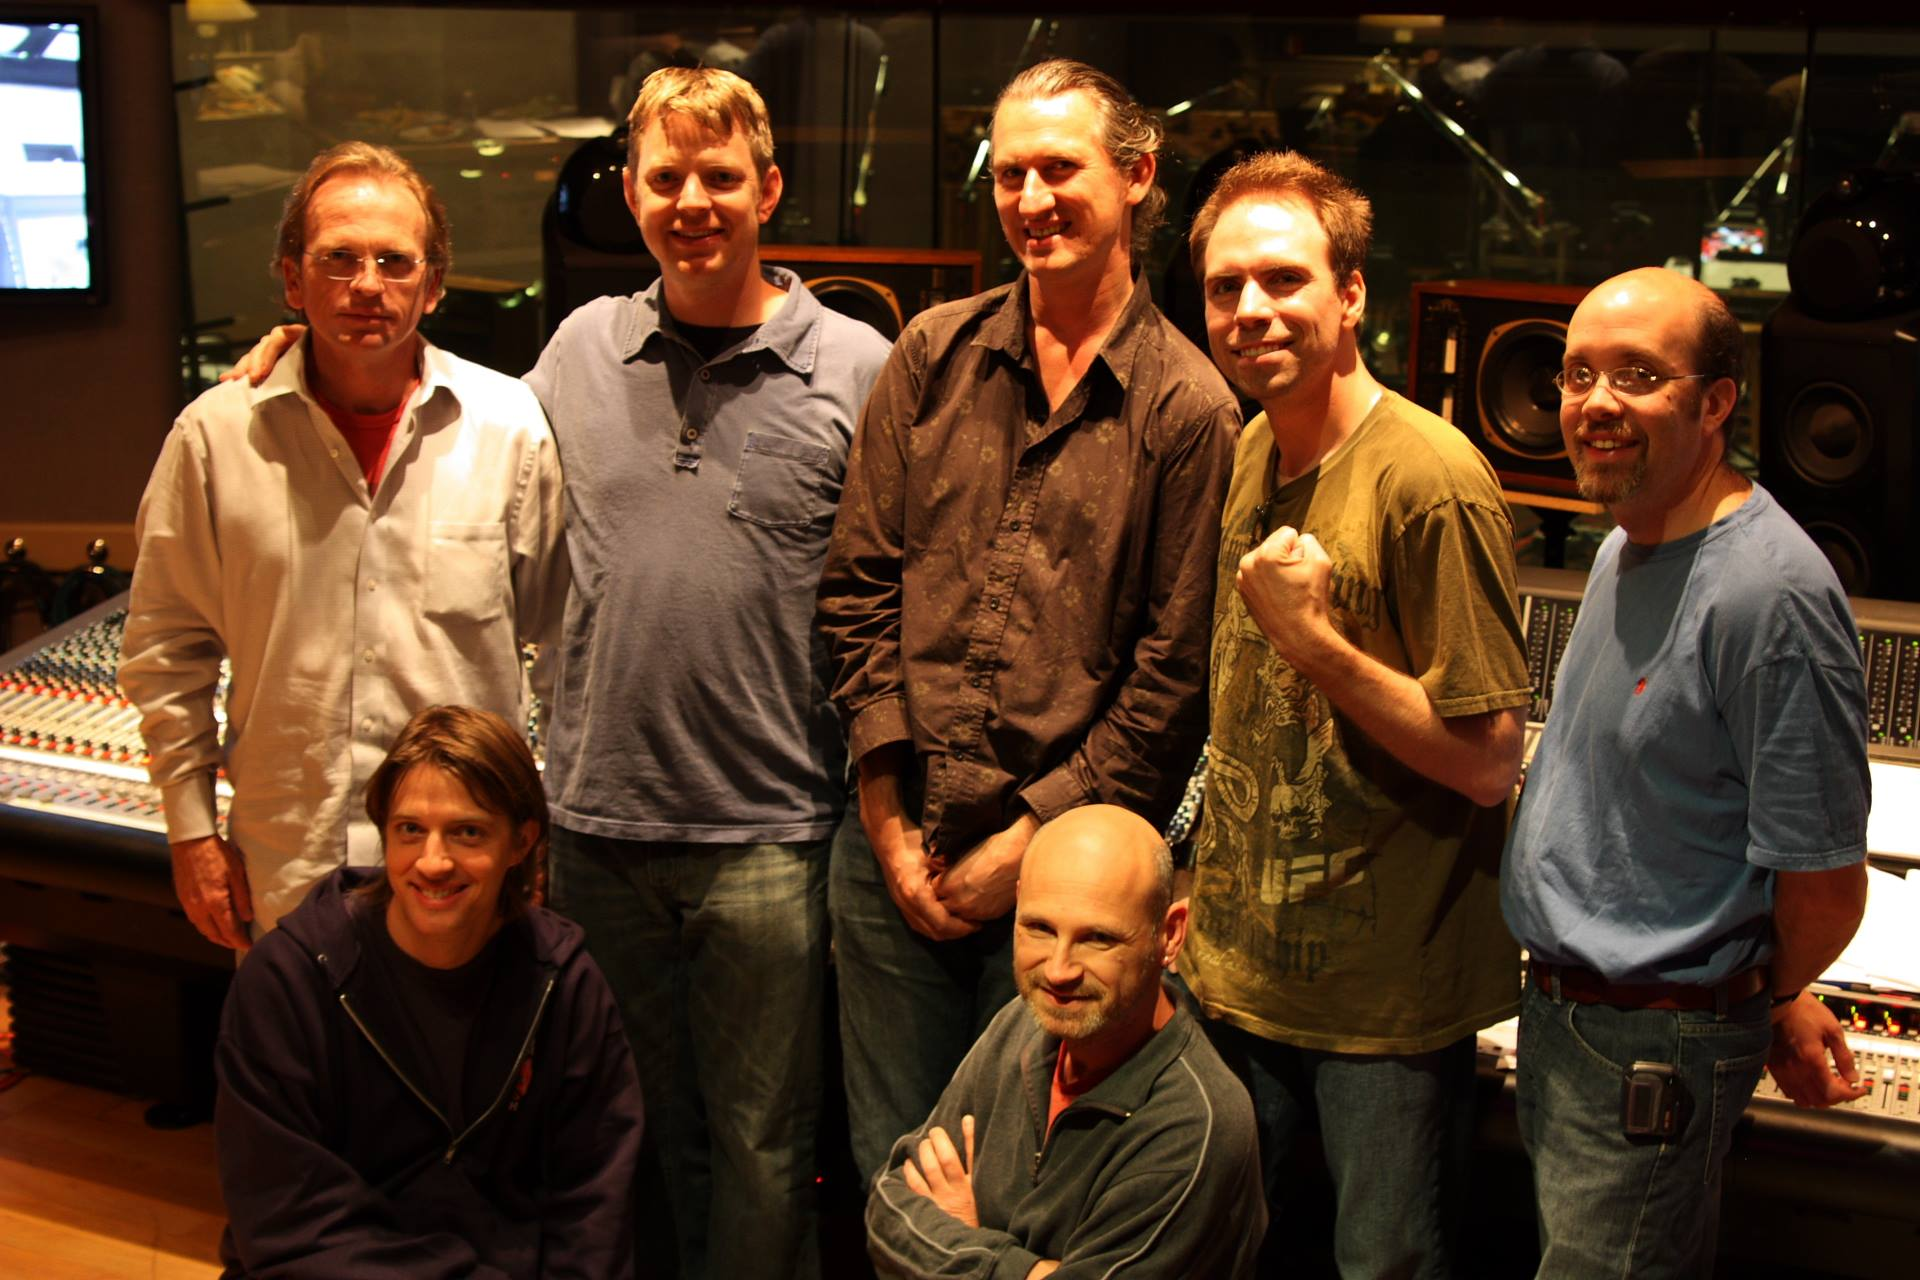 The Red Alert 3 scoring session crew: Top: Jeff Vaughn, Tim Wynn, Nick Laviers, Frank Klepacki, Dann Thompson. Bottom: Phillip White, Andre Zweers. Skywalker Sound, 2008.